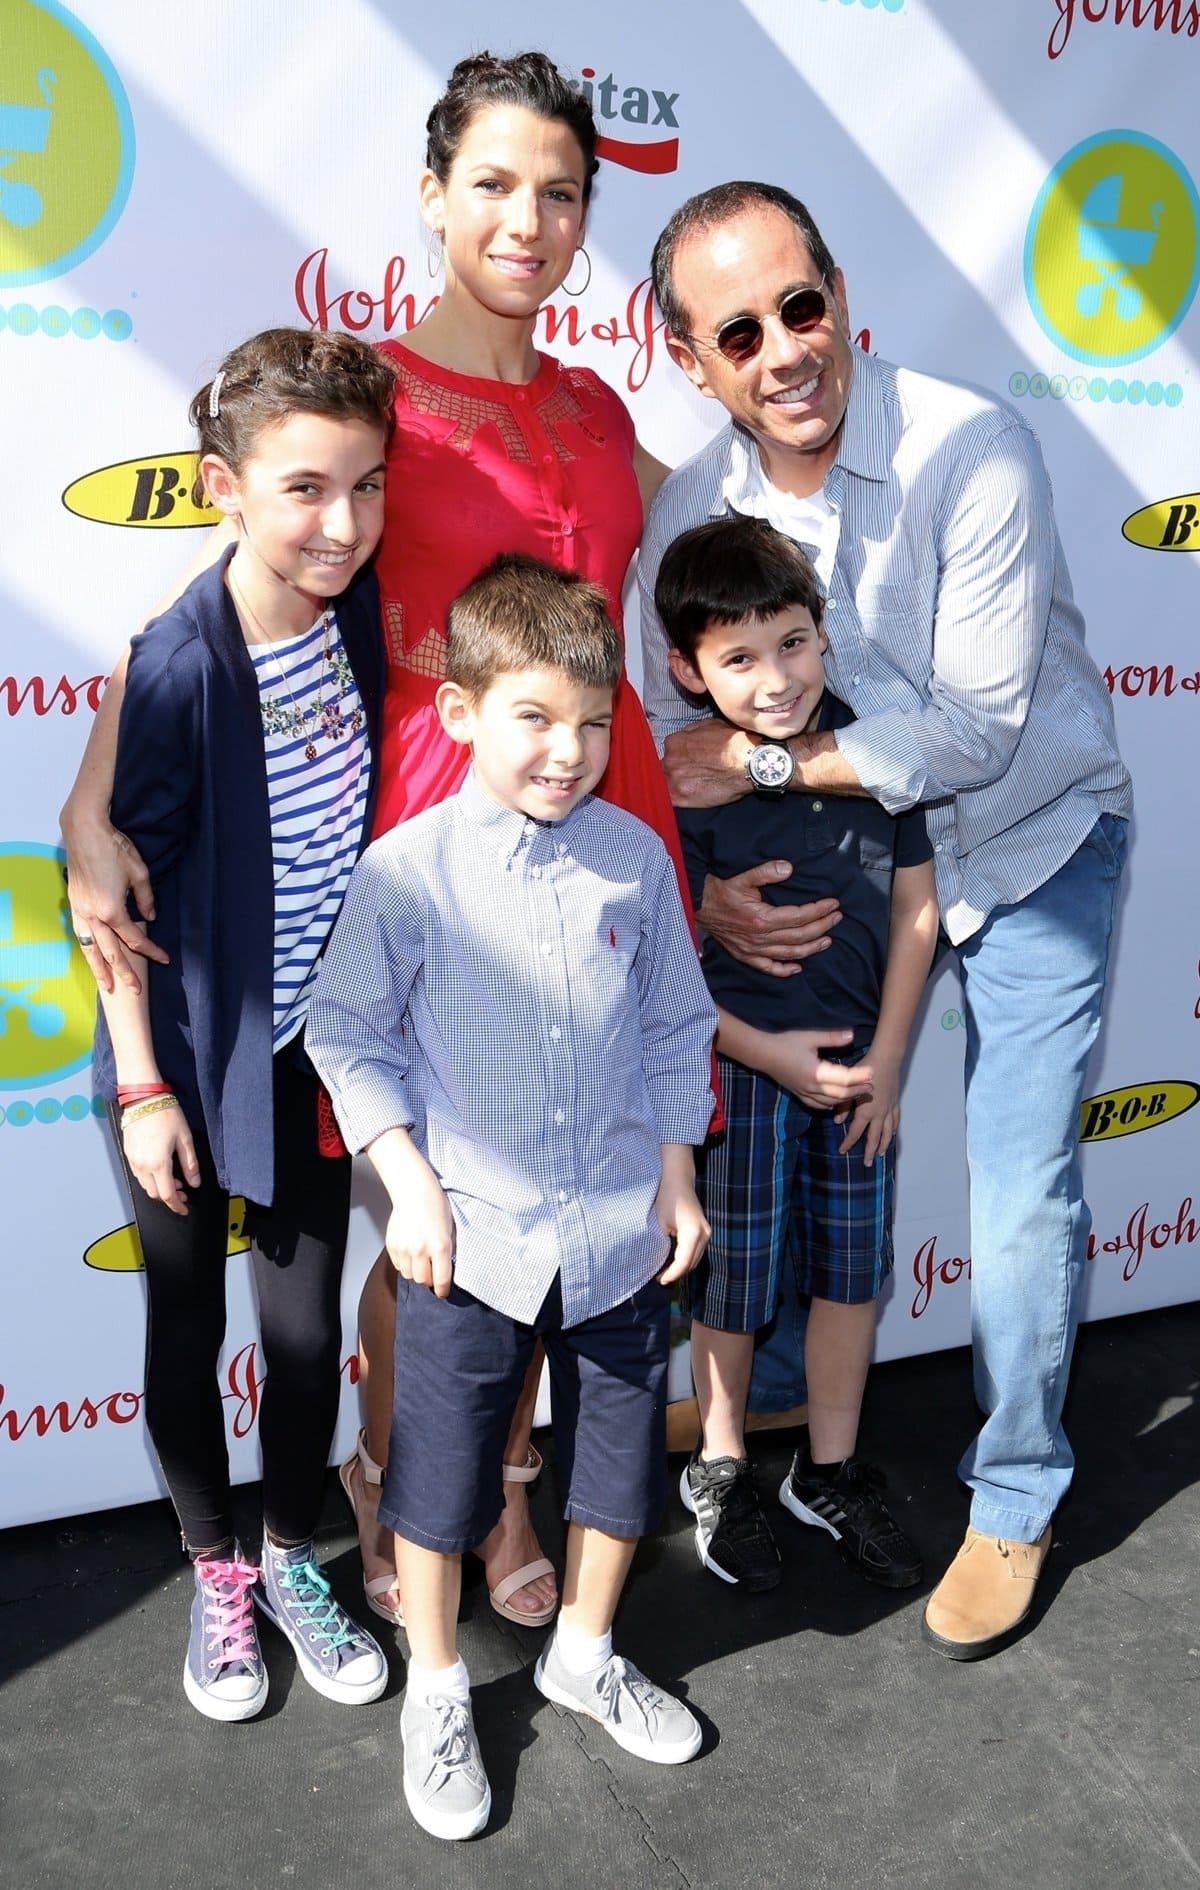 Jerry and Jessica Seinfeld with their three children Sascha (born November 7, 2000), Julian Kal (born March 1, 2003), and Shepherd Kellen (born August 22, 2005)